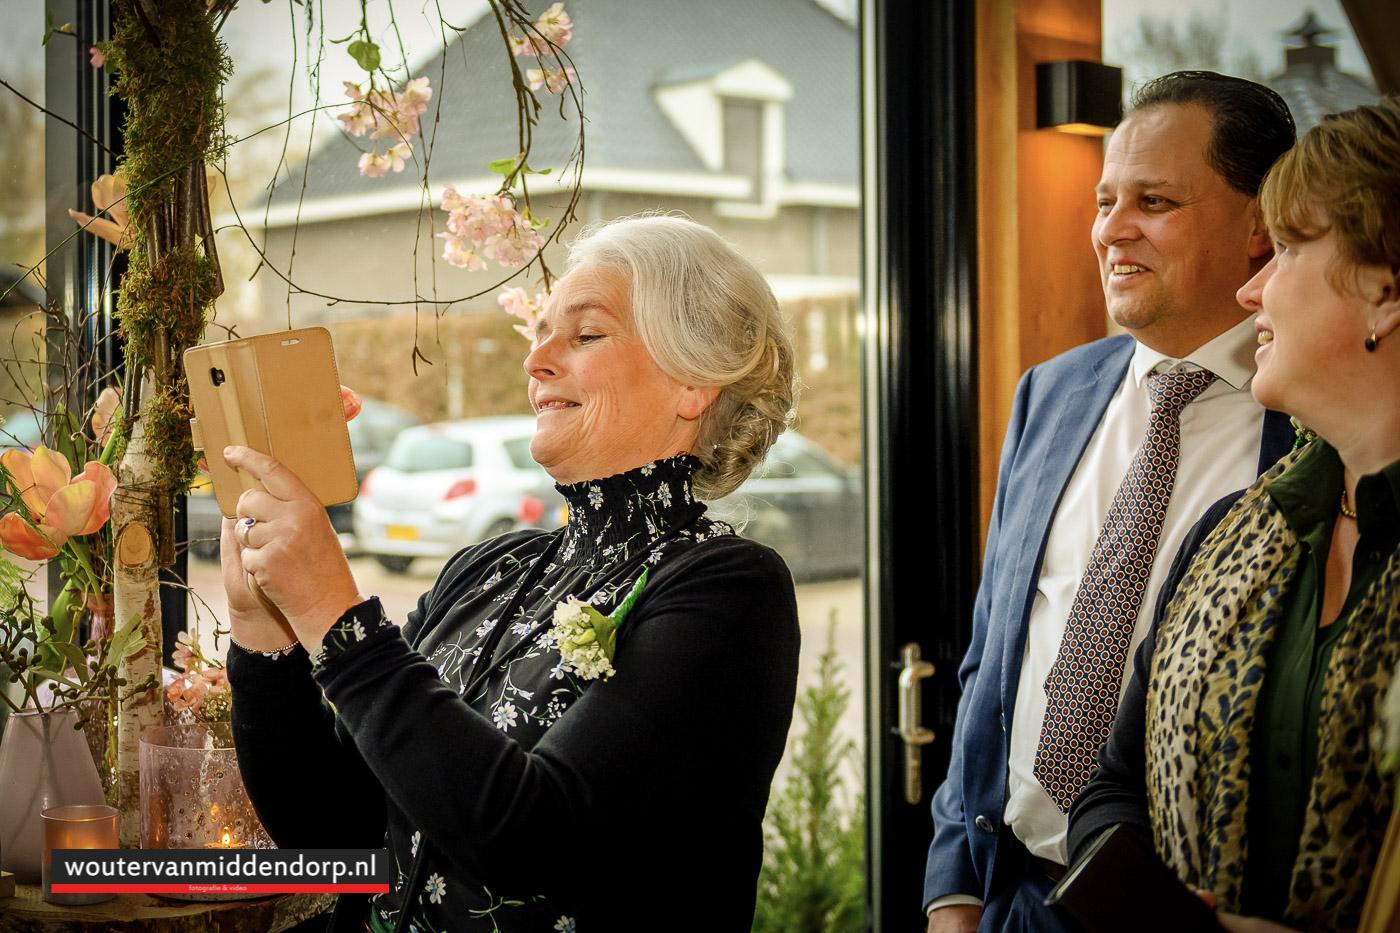 bruidsfotografie Wouter van Middendorp Uddel Elspeet Barneveld, omgeving trouwfotograaf-22